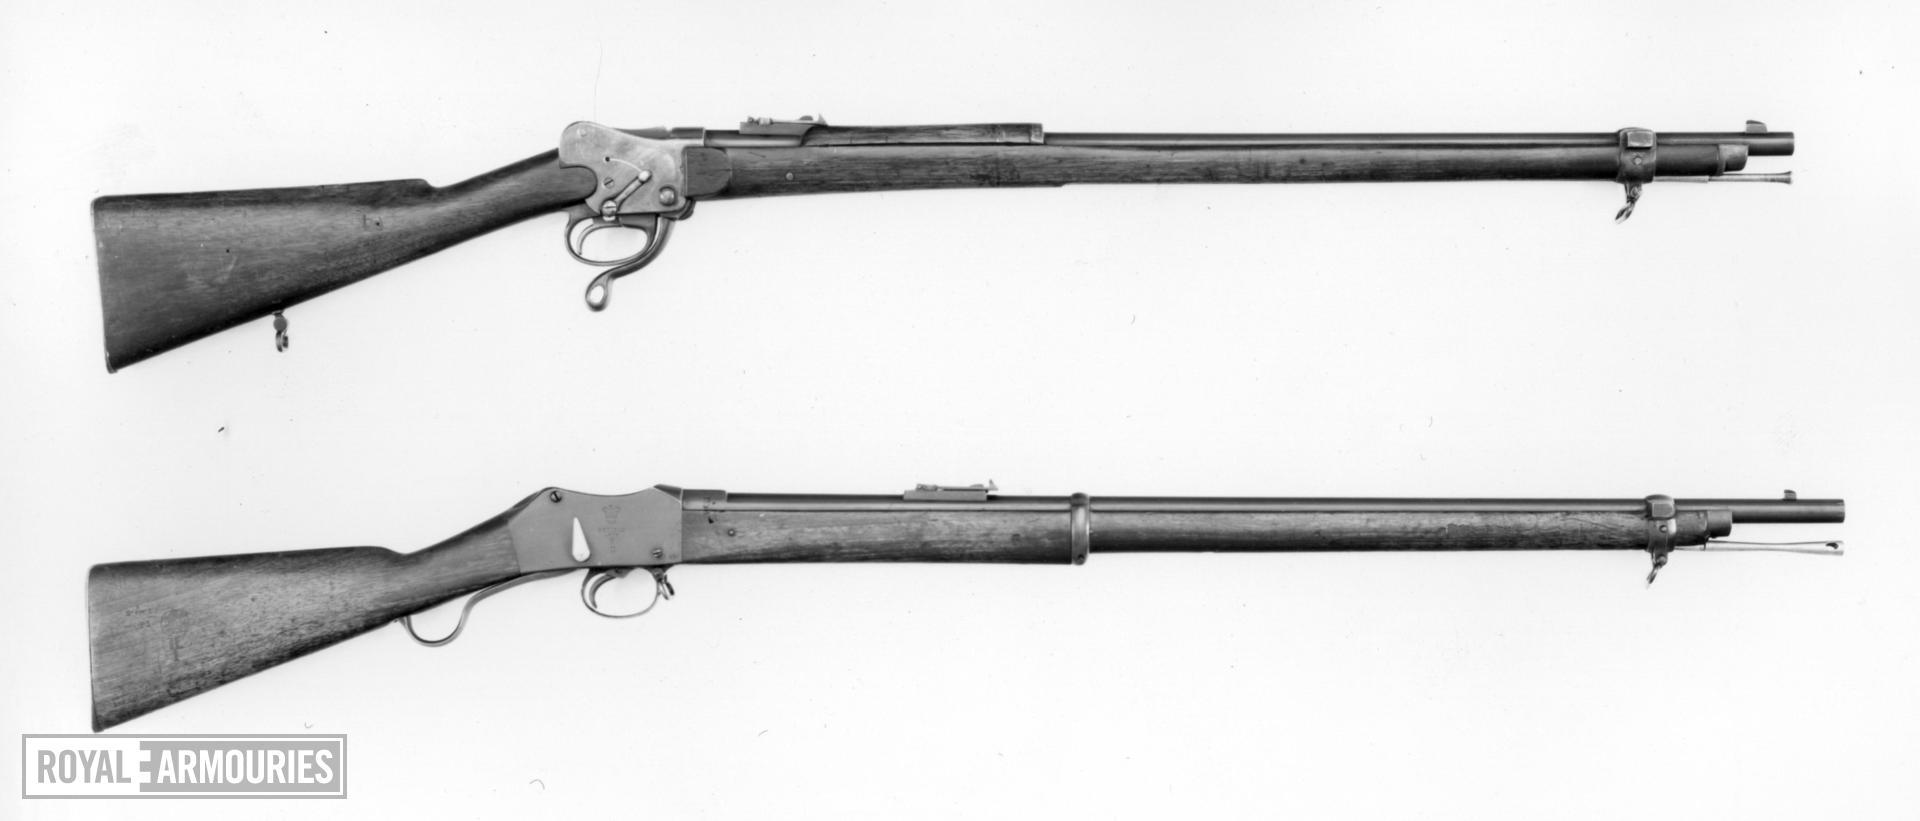 Centrefire breech-loading rifle - Fields Patent